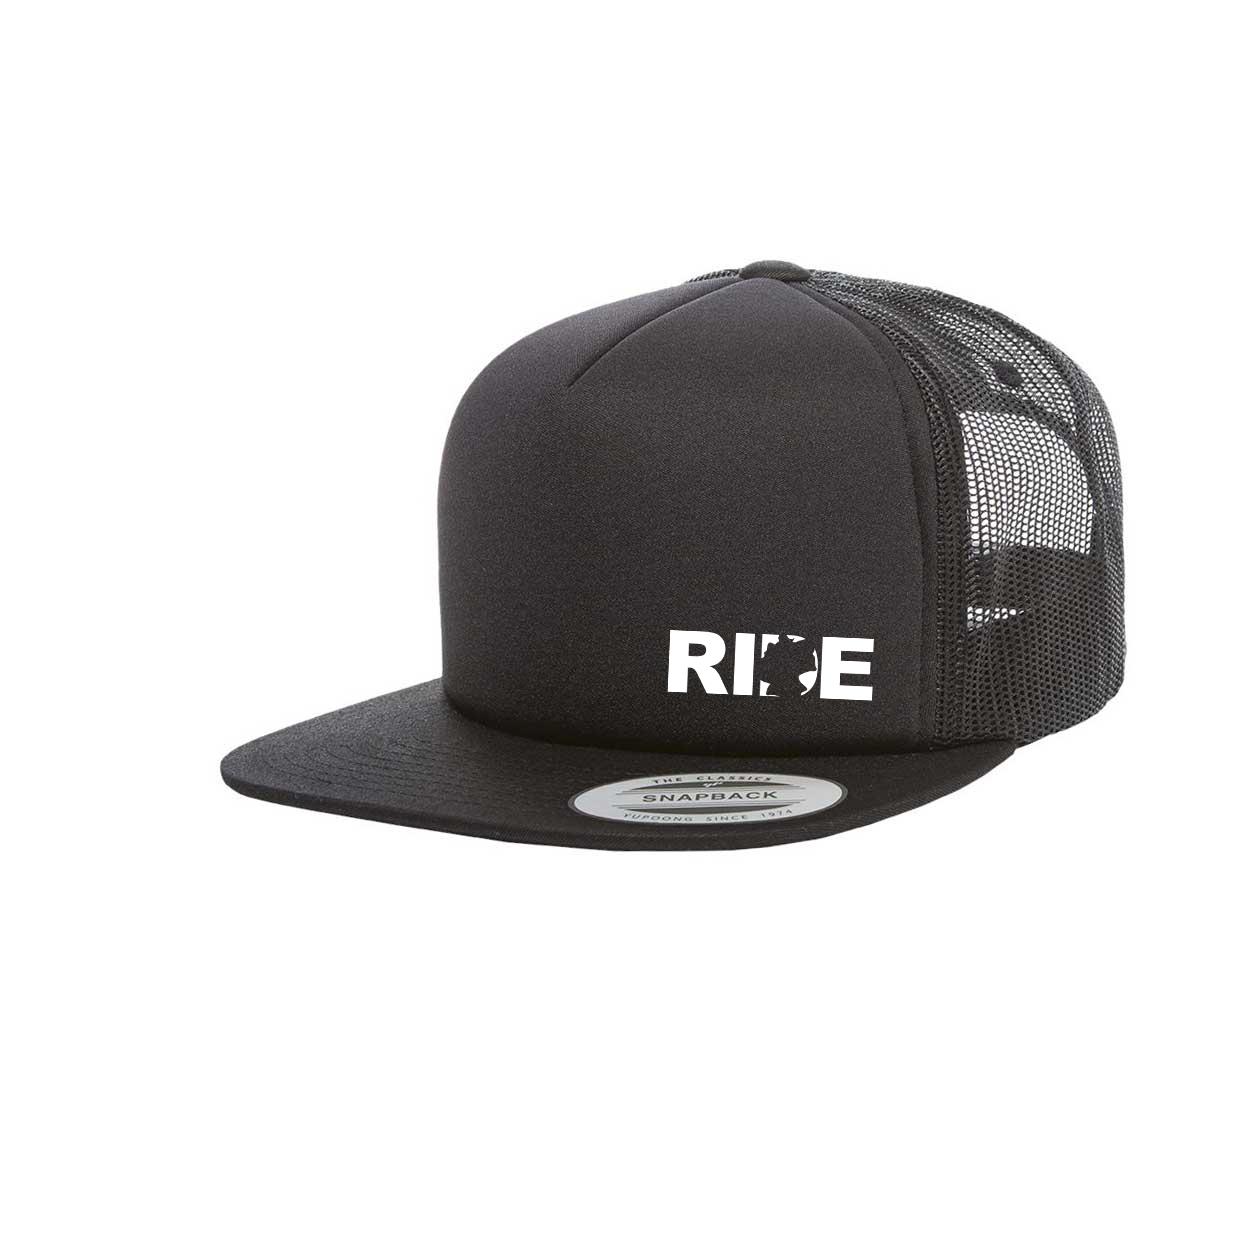 Ride Germany Night Out Premium Foam Flat Brim Snapback Hat Black (White Logo)